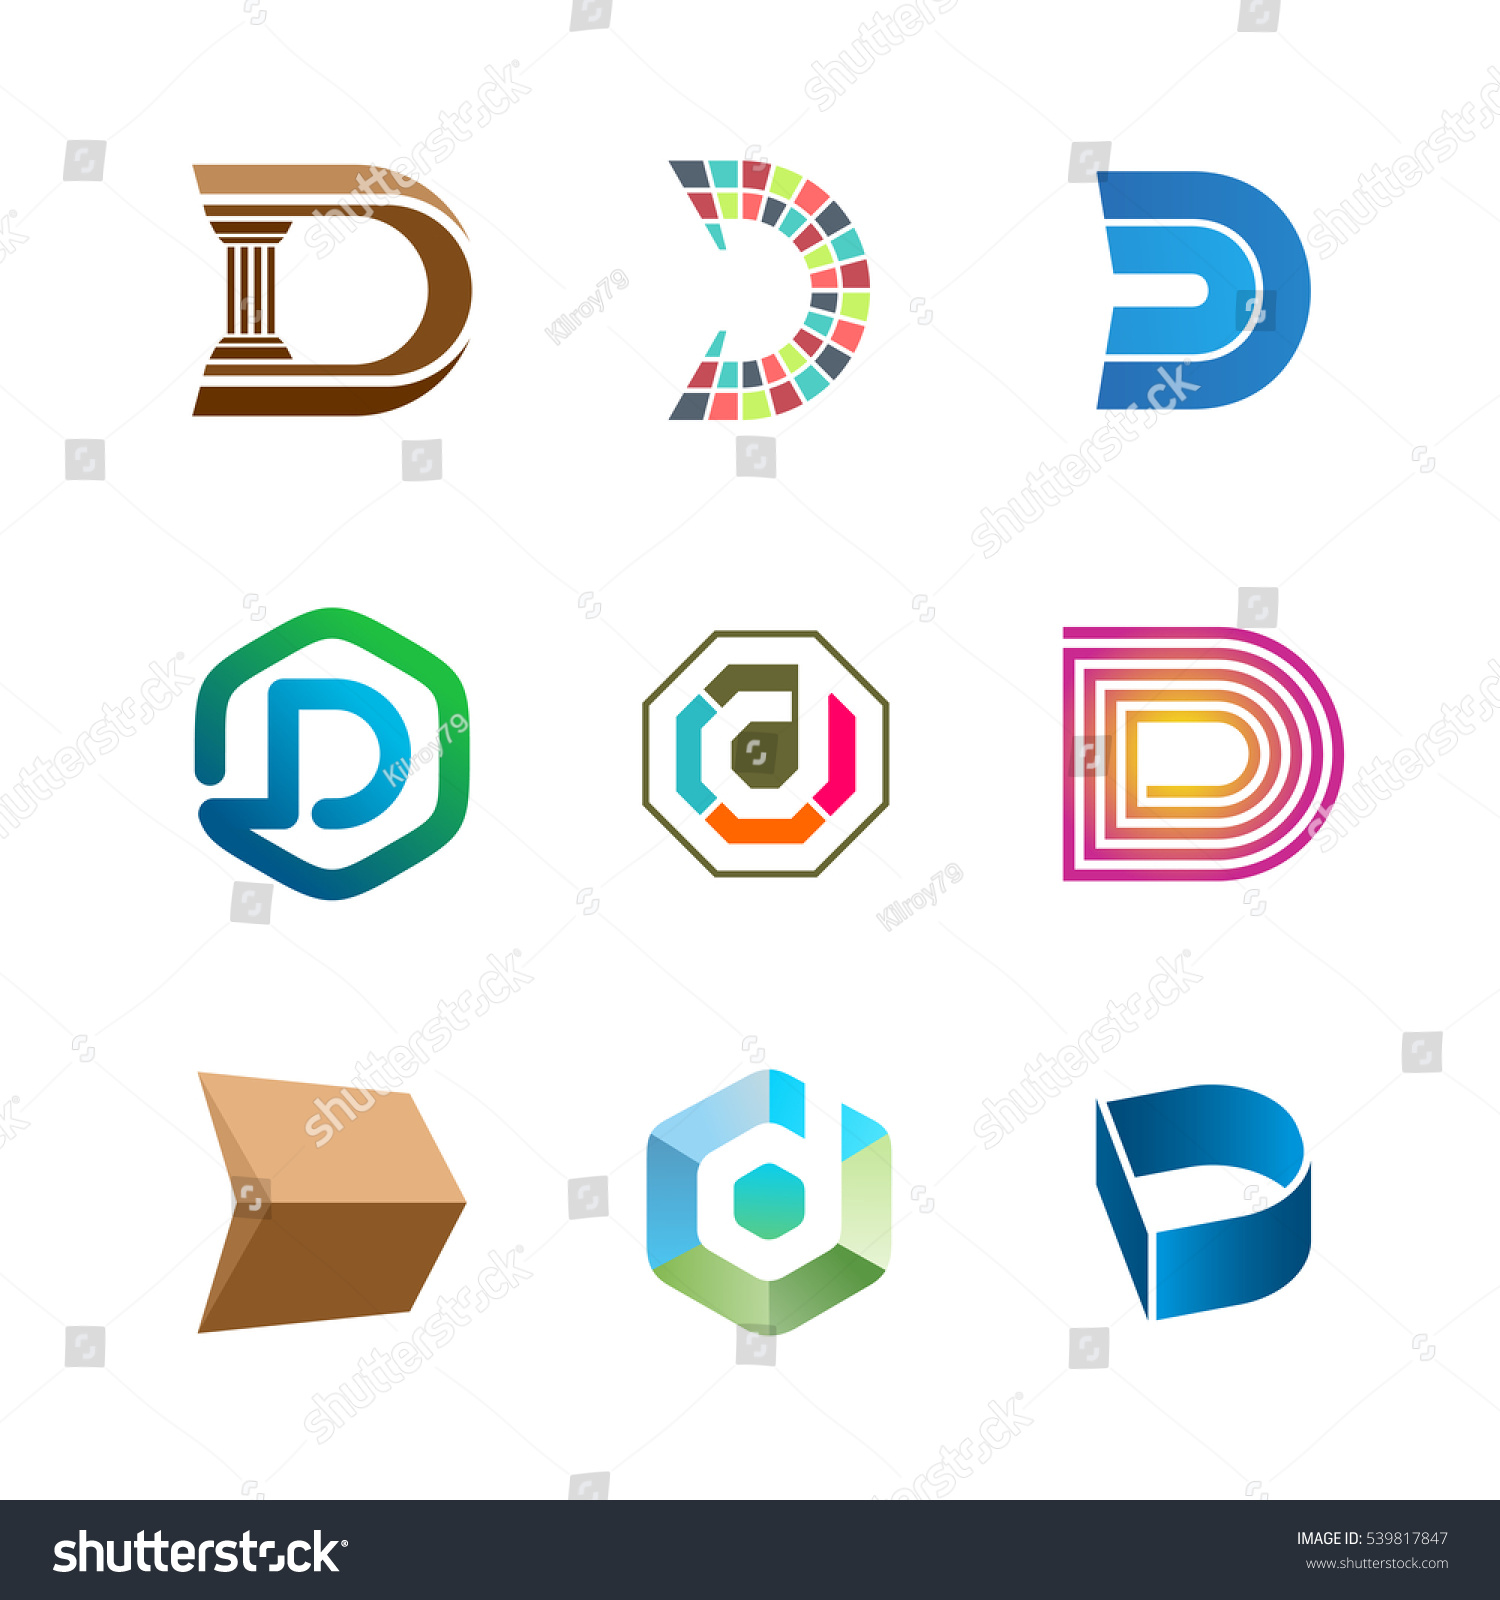 letter d logo set color icon のベクター画像素材 ロイヤリティフリー